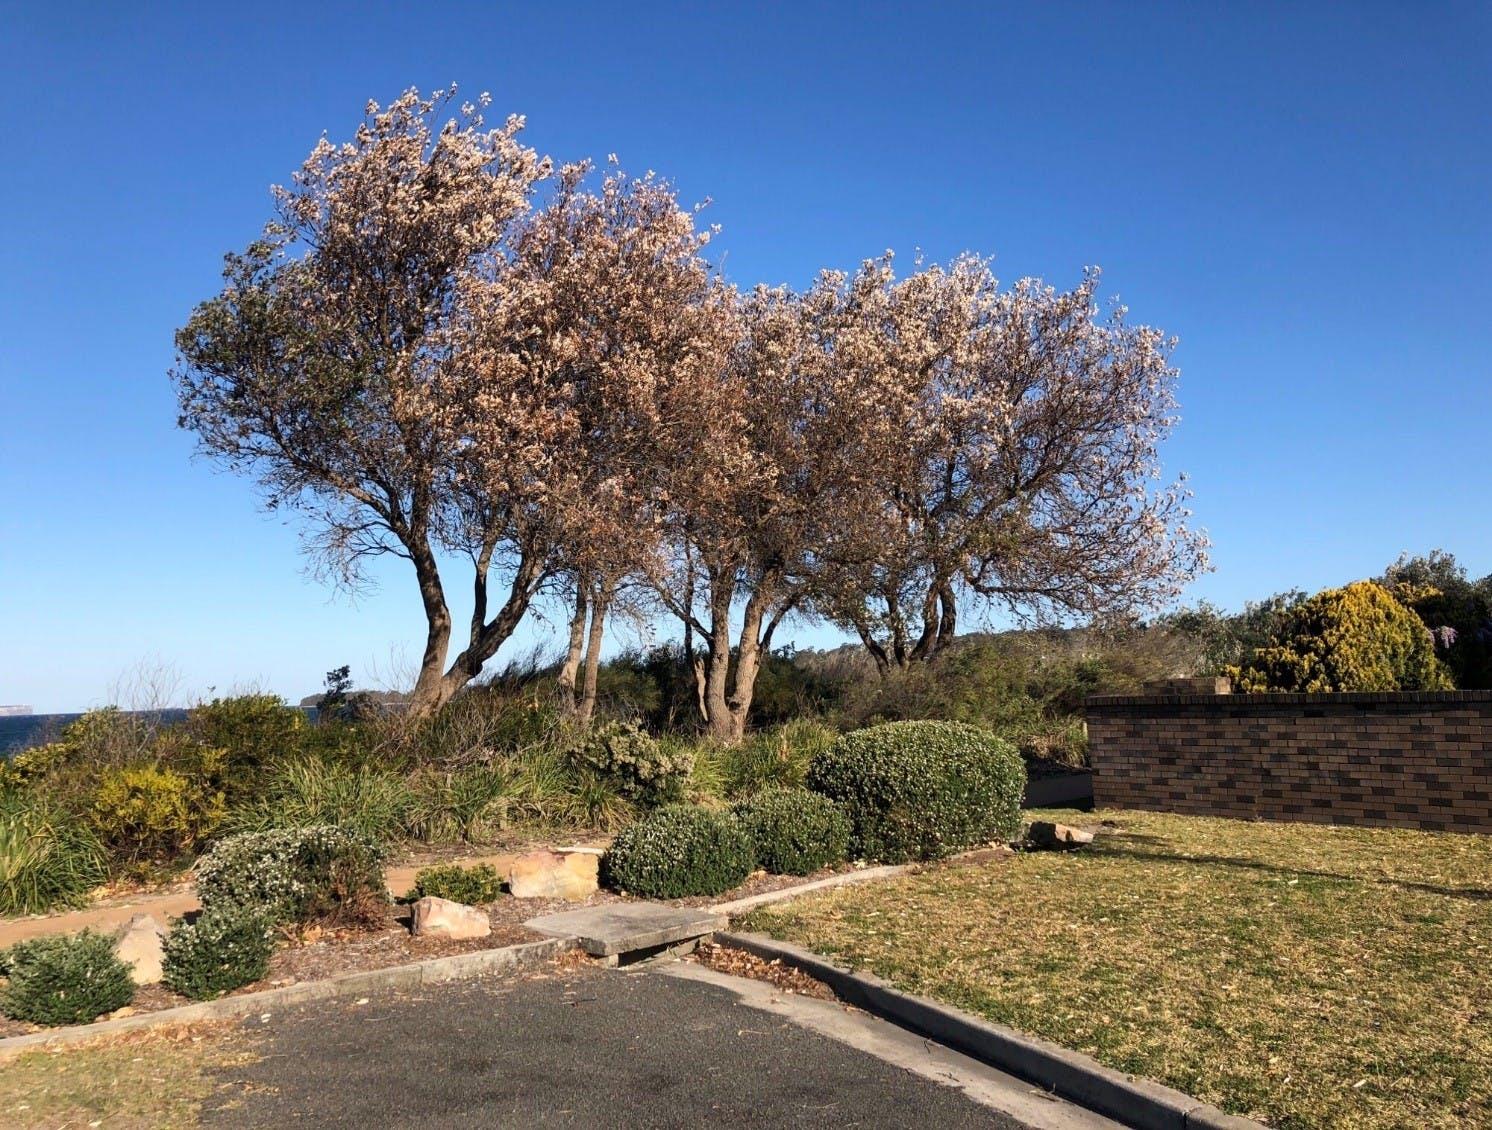 Vegetation Vandalism Example - Nov 2018